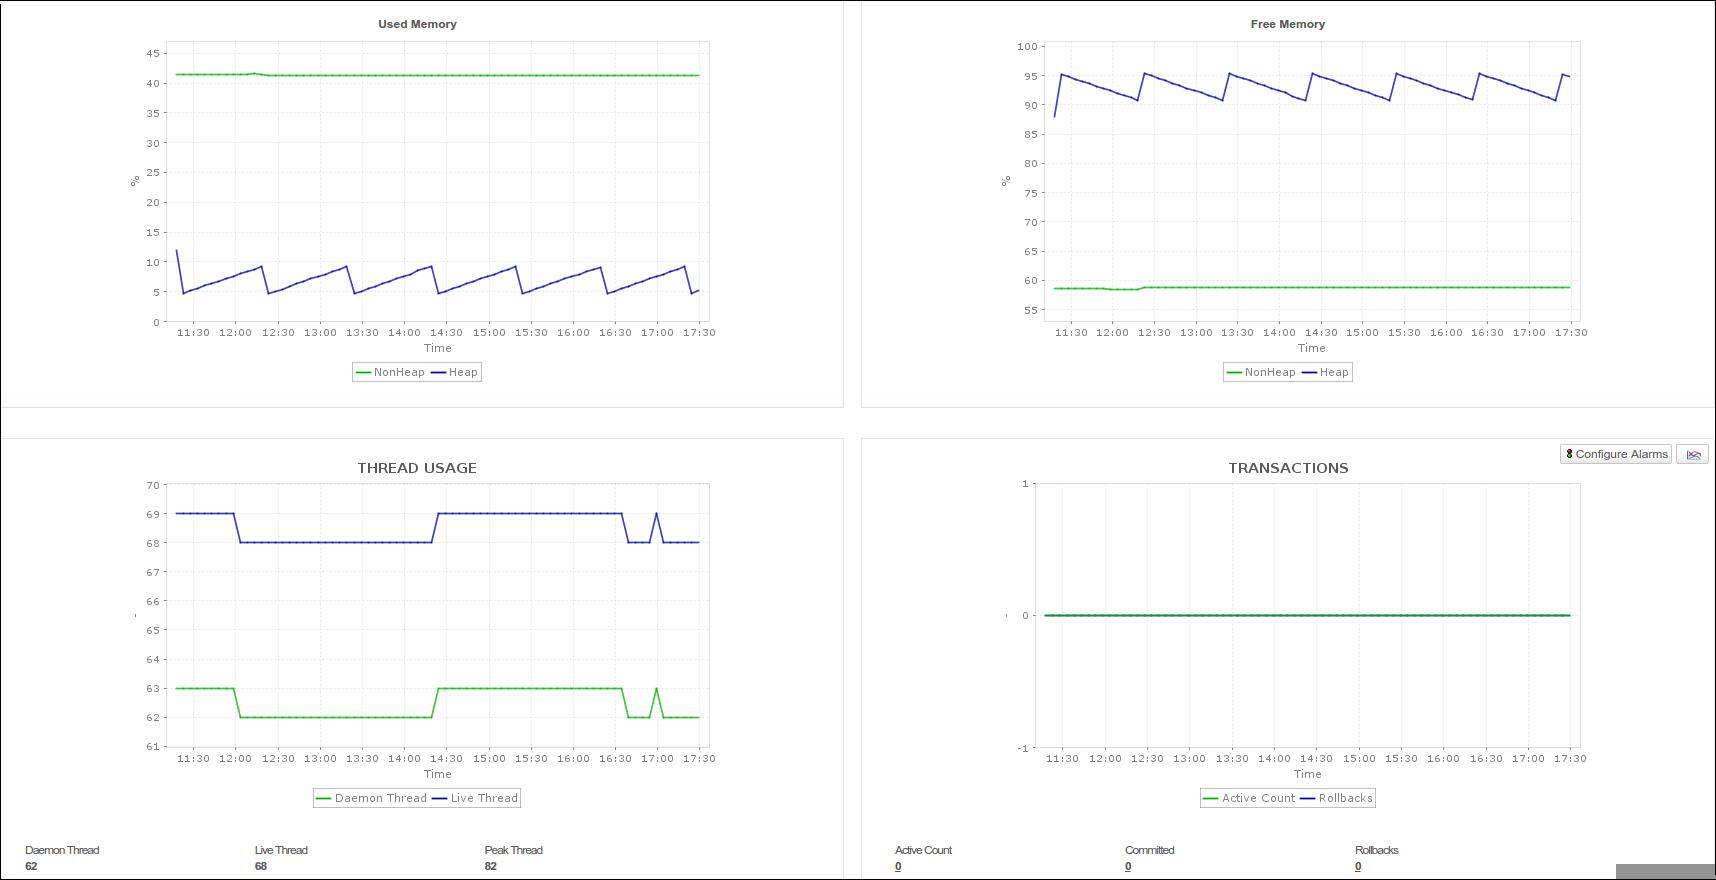 geronimo threads, geronimo server thread usage, geronimo transactions